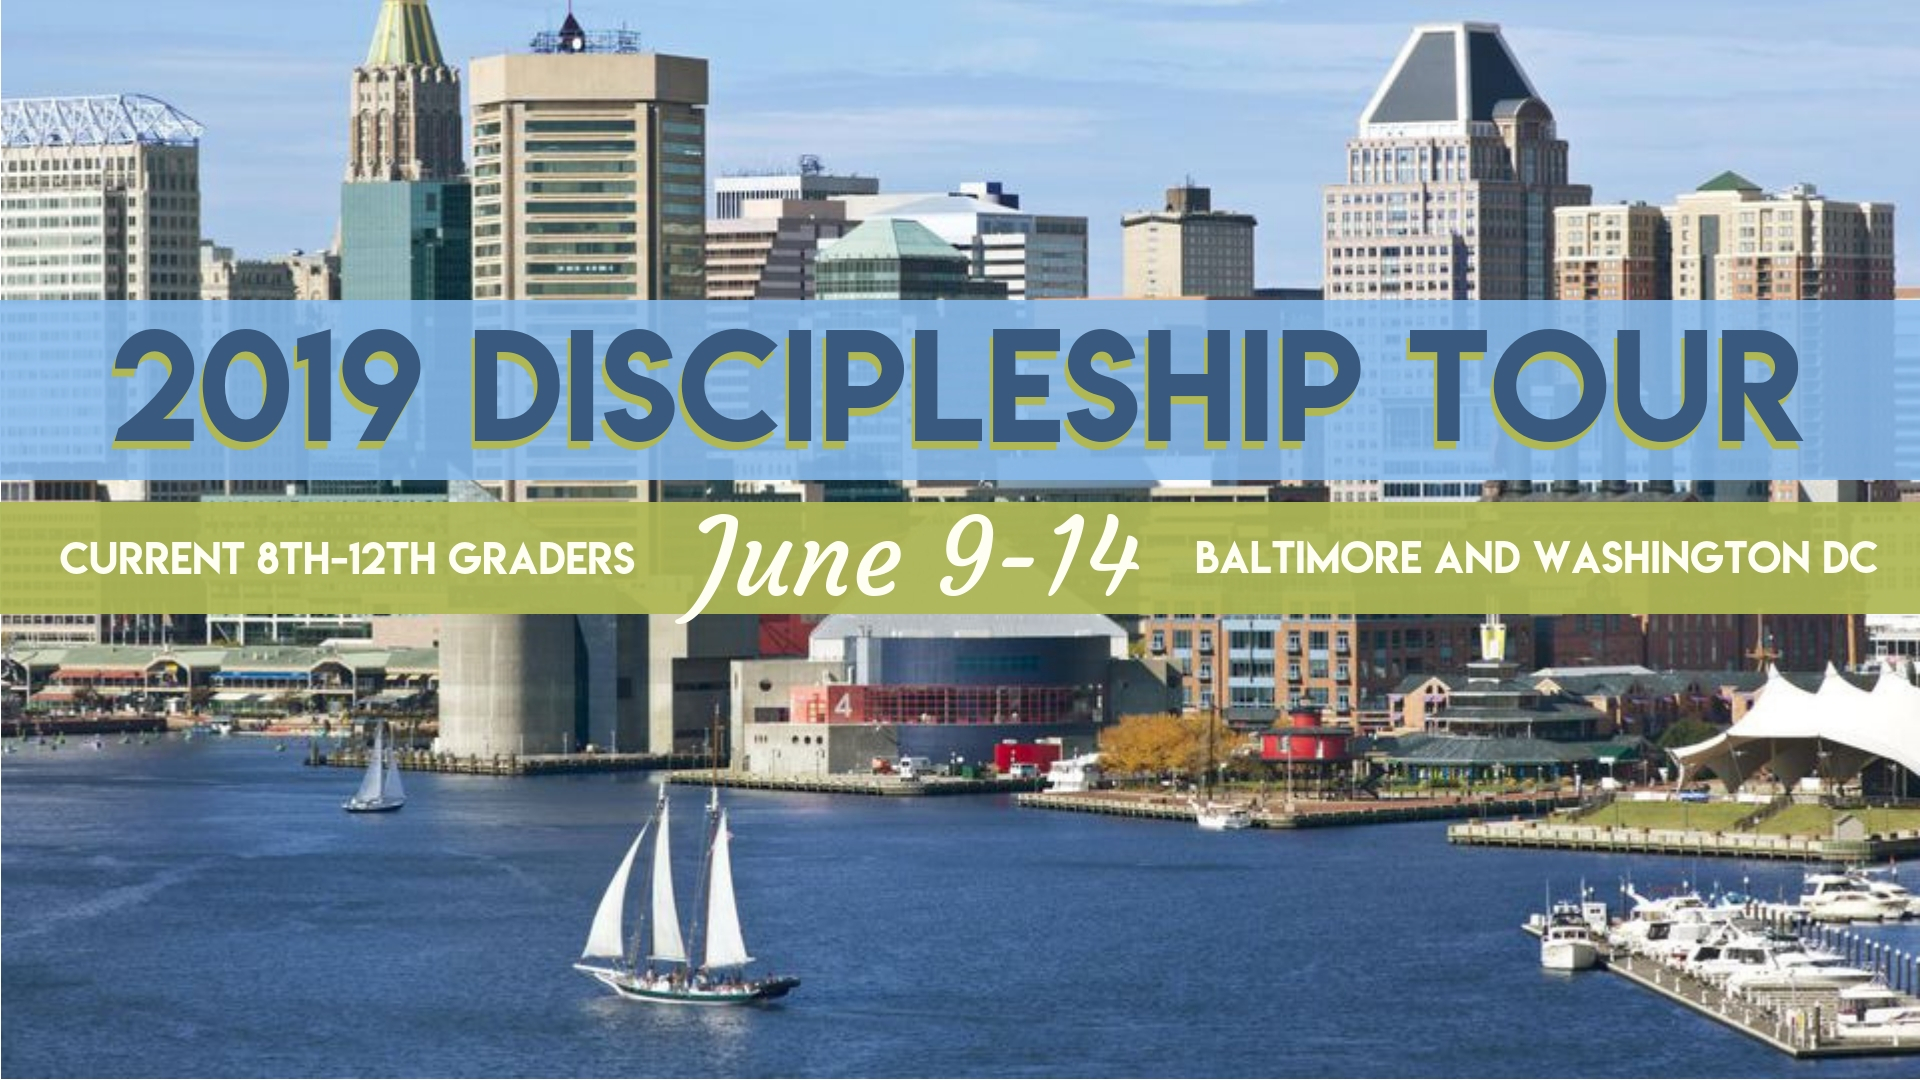 2019 Discipleship TOUR.jpg